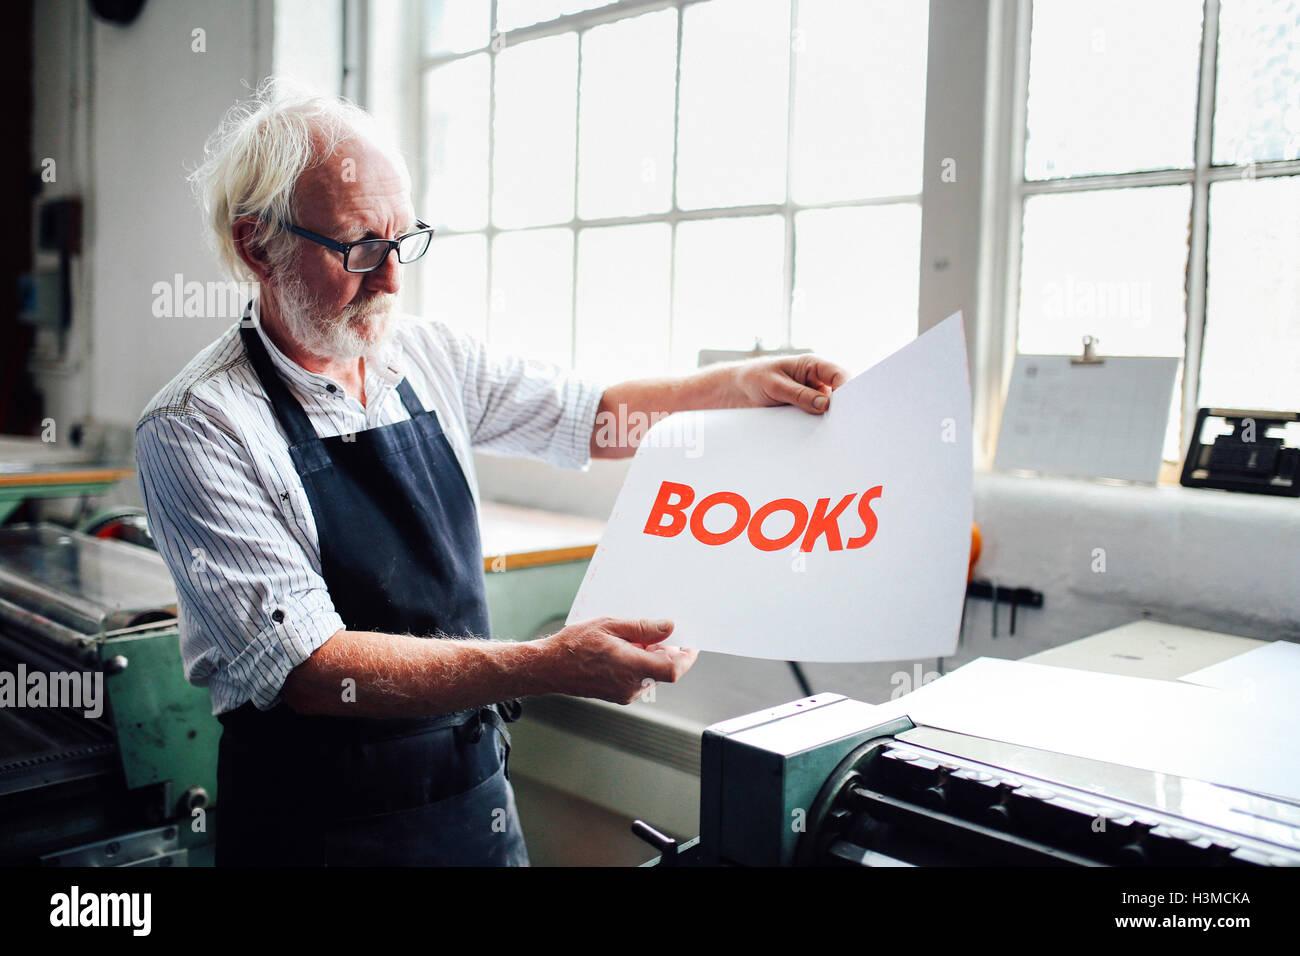 Senior craftsman/technician holding up letterpress print in book arts workshop - Stock Image